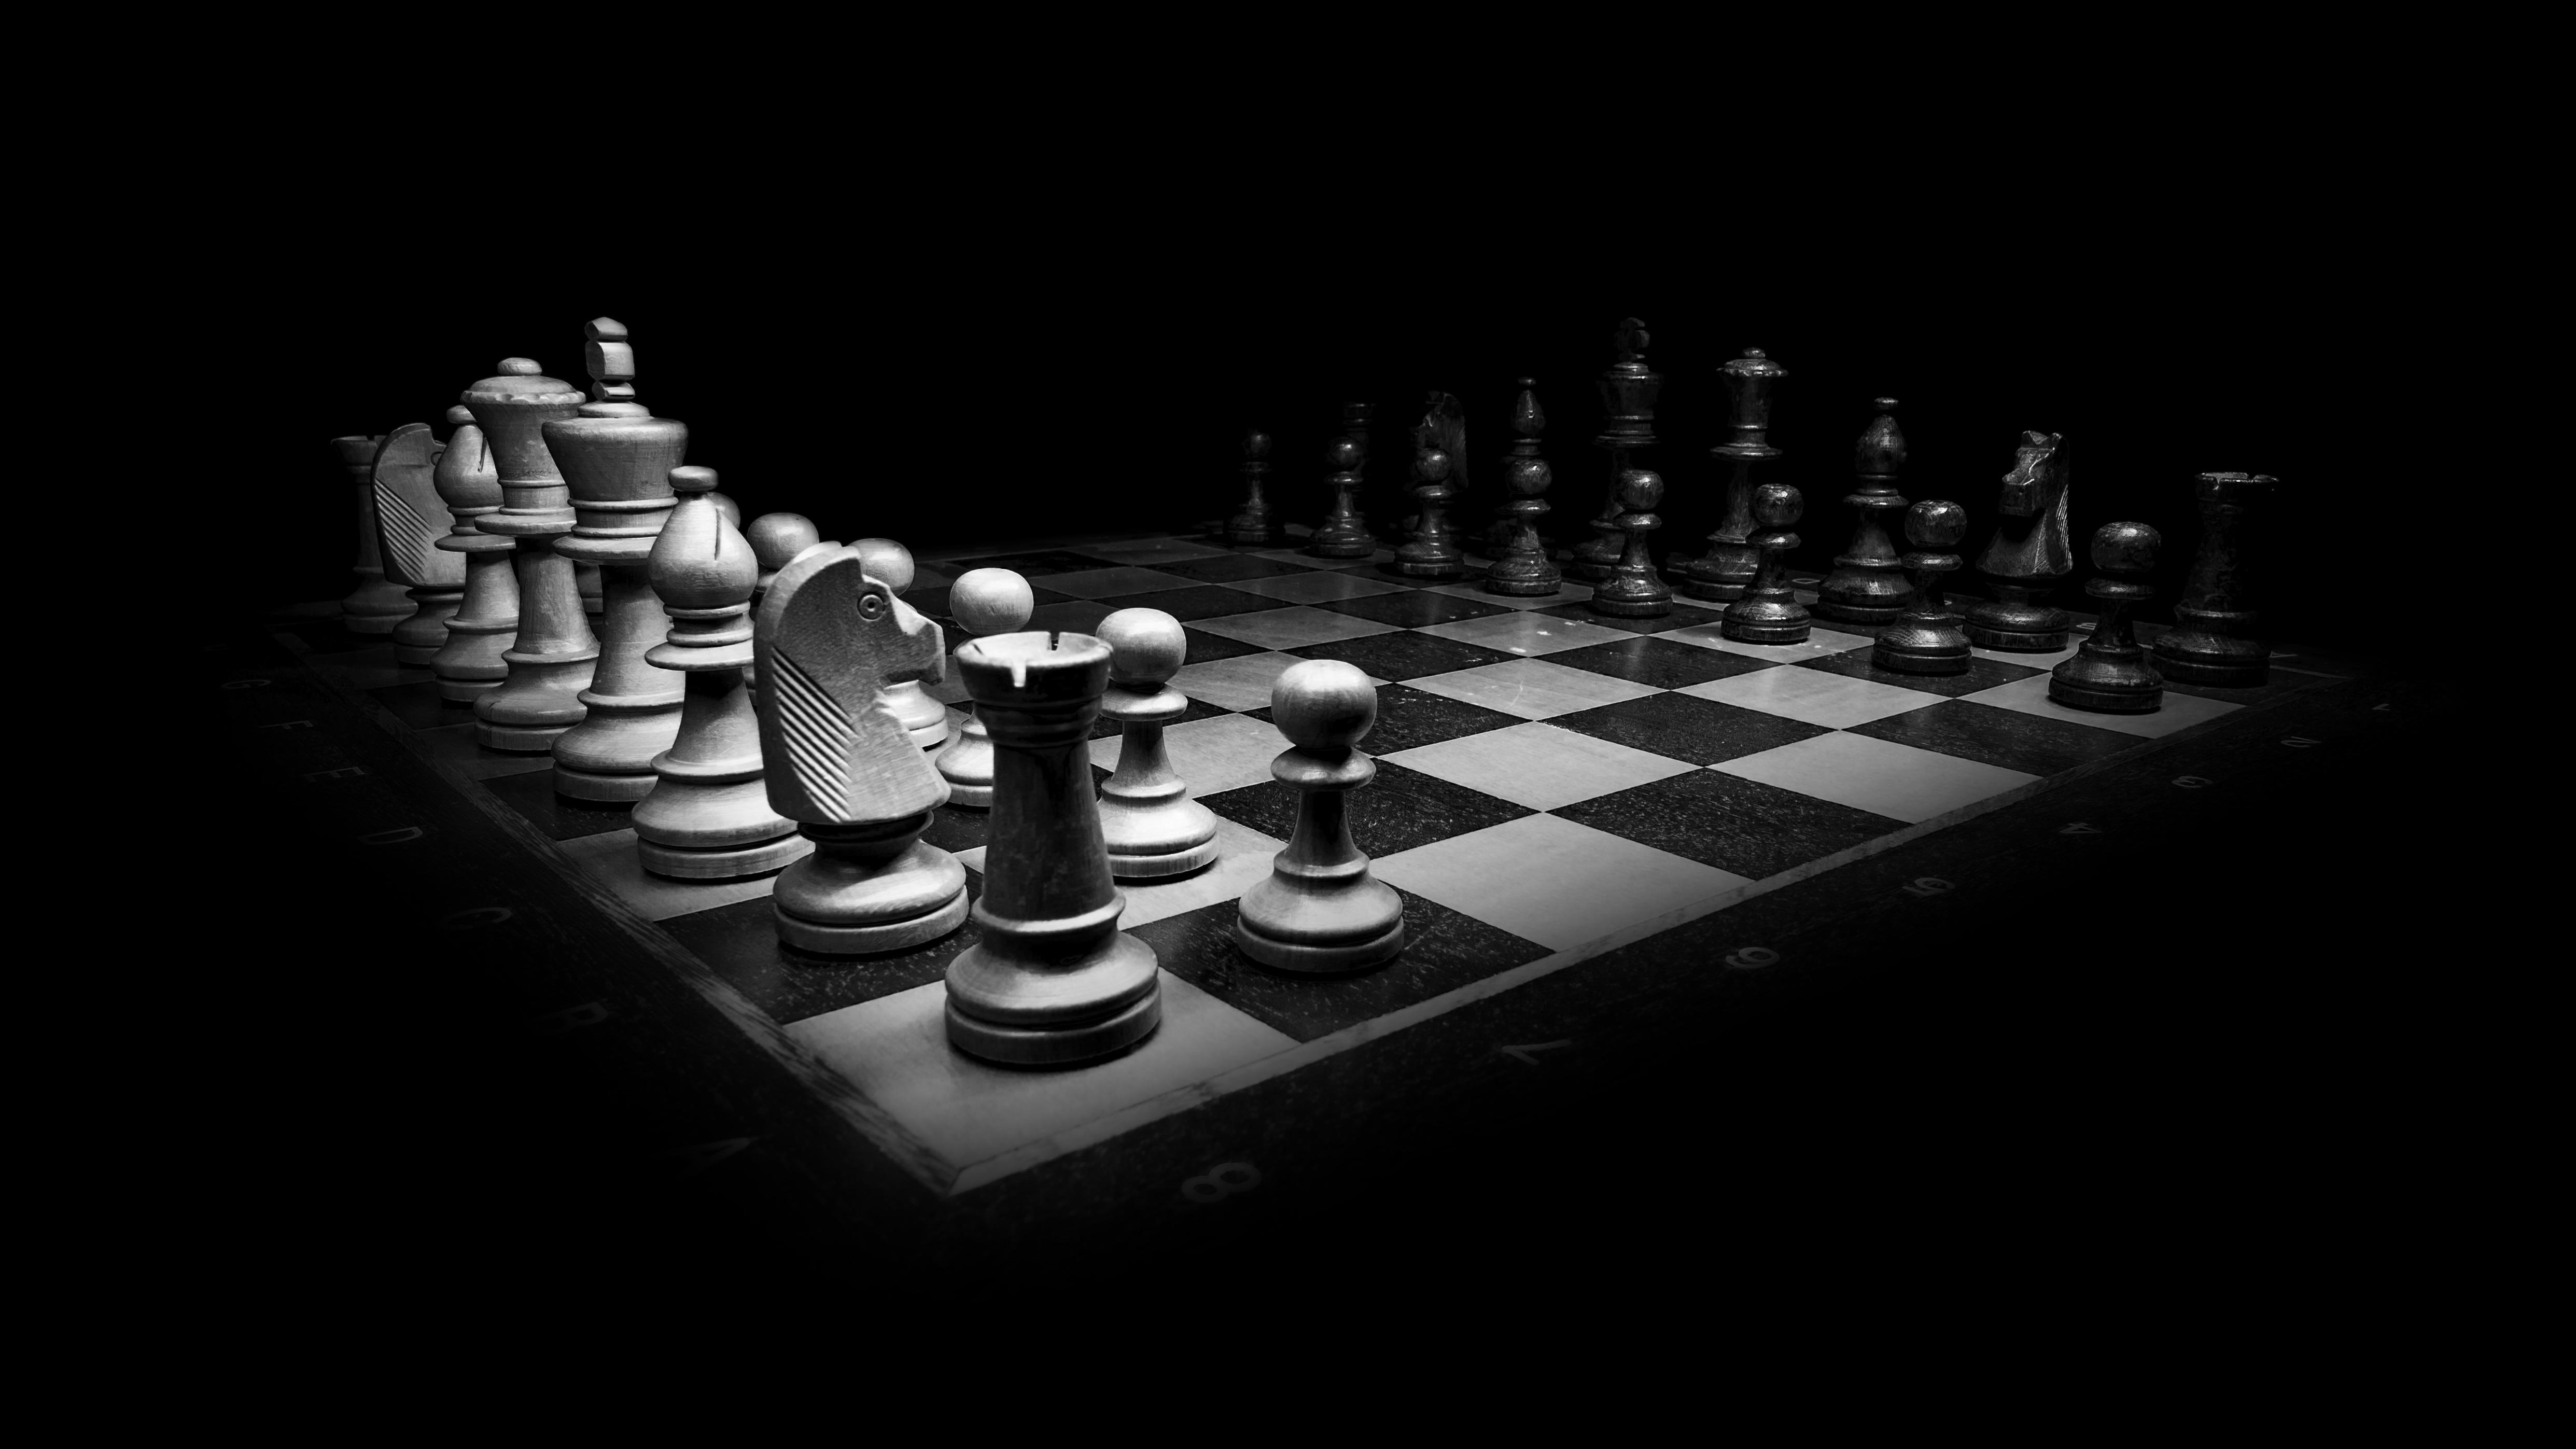 Chess Board And Pieces 4k Ultra Papel De Parede Hd Plano De